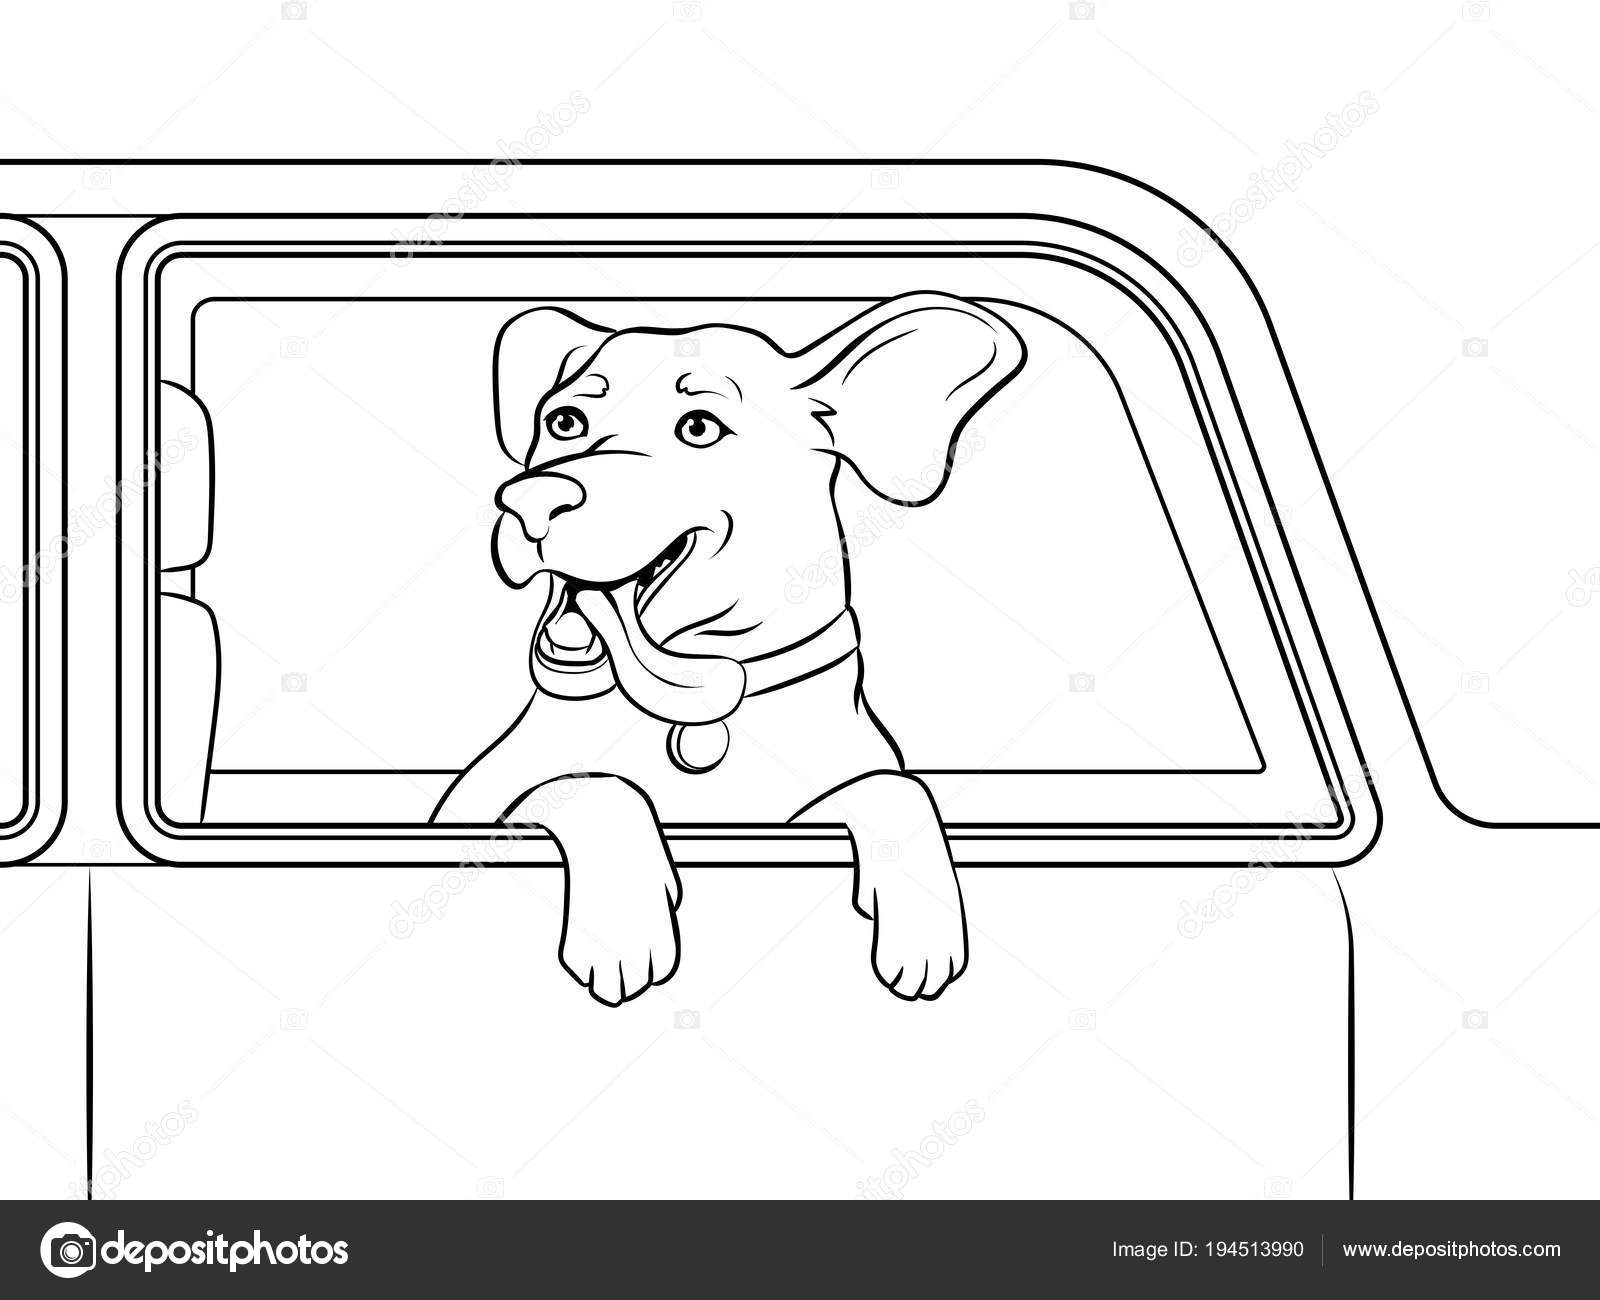 kleurplaten nl kleurplaat hoofd hond